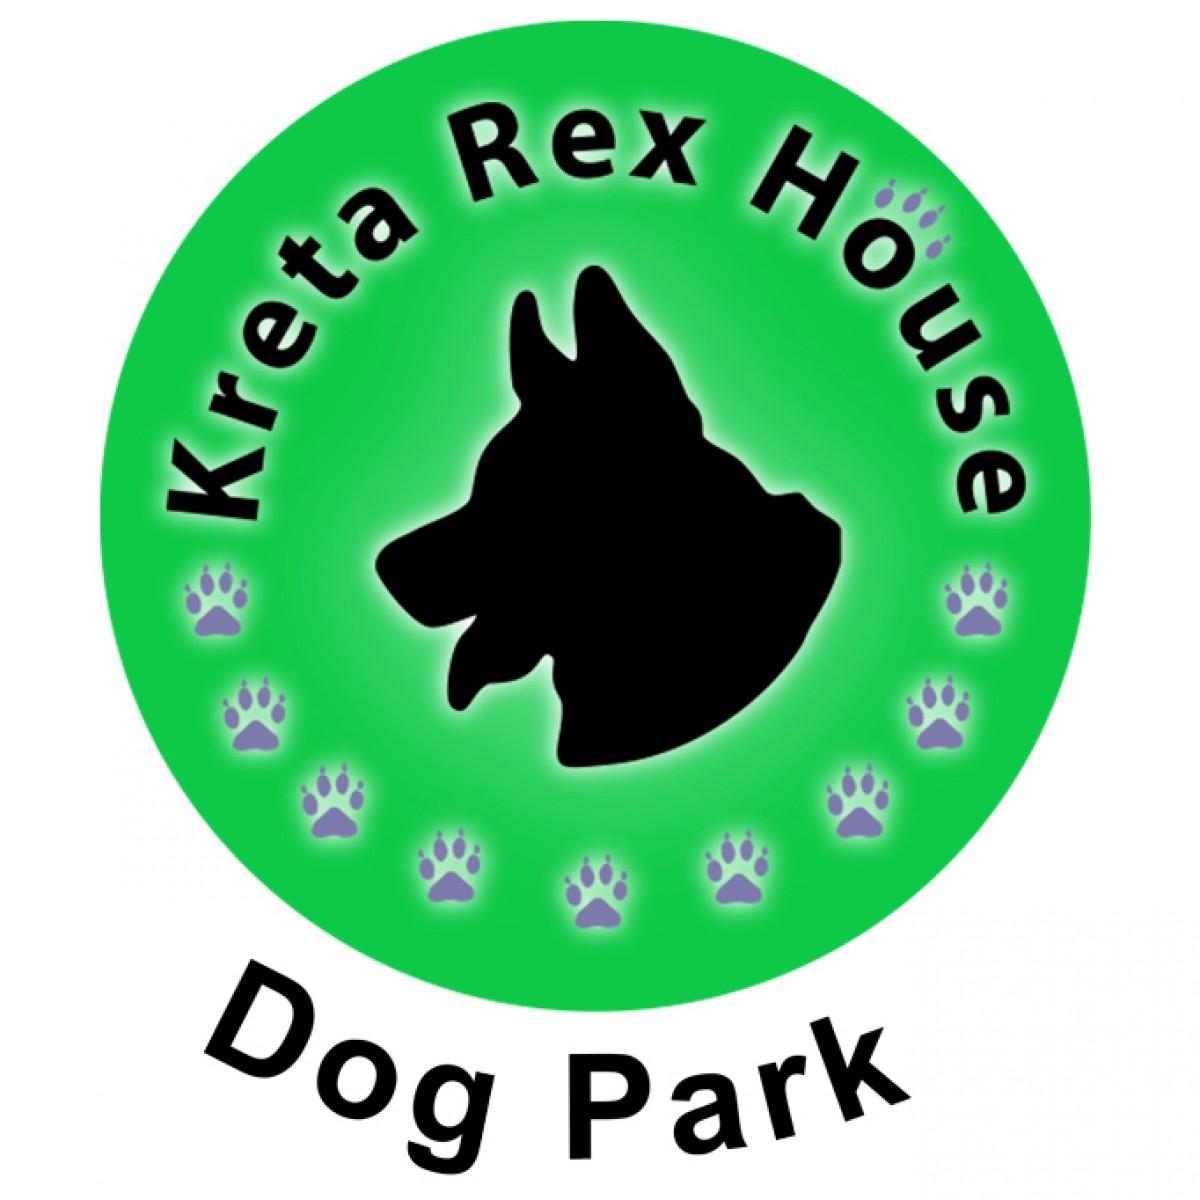 Kreta Rex House - Dog Park